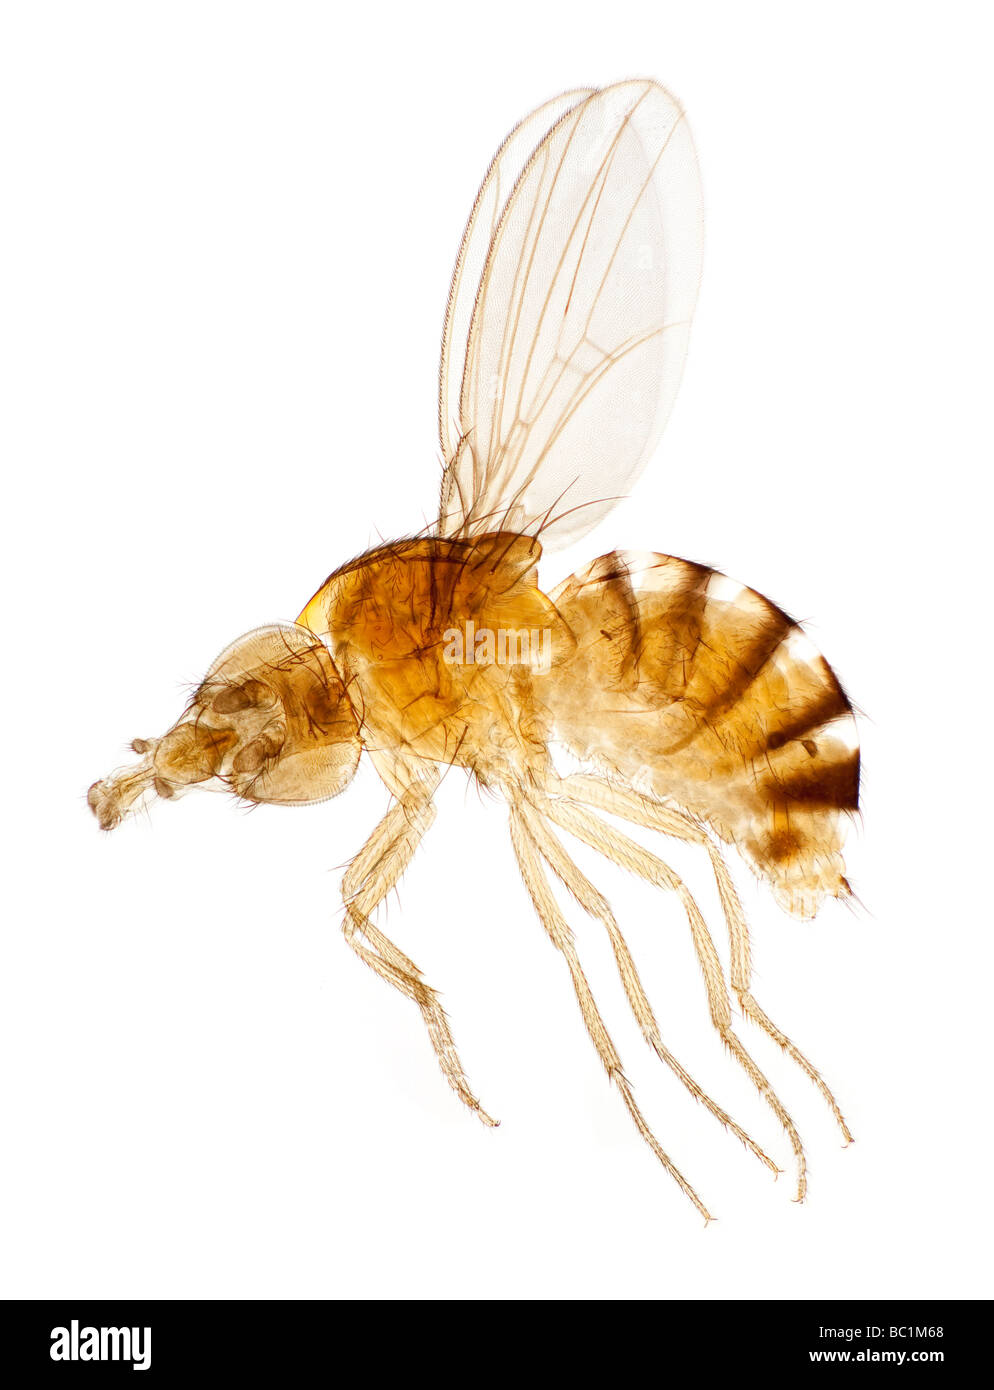 The White Eyed Drosophila Vinegar Fly or Fruit fly, brightfield photomicrograph - Stock Image